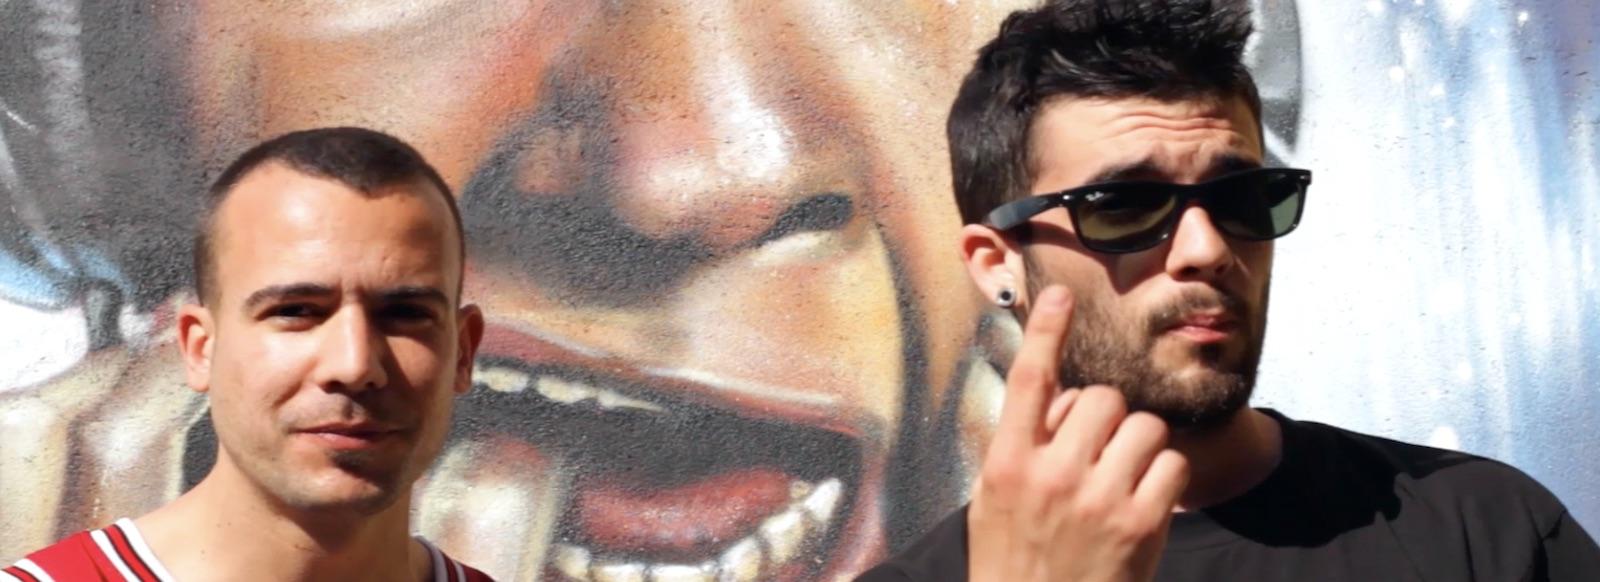 hip hop videoclip barcelona